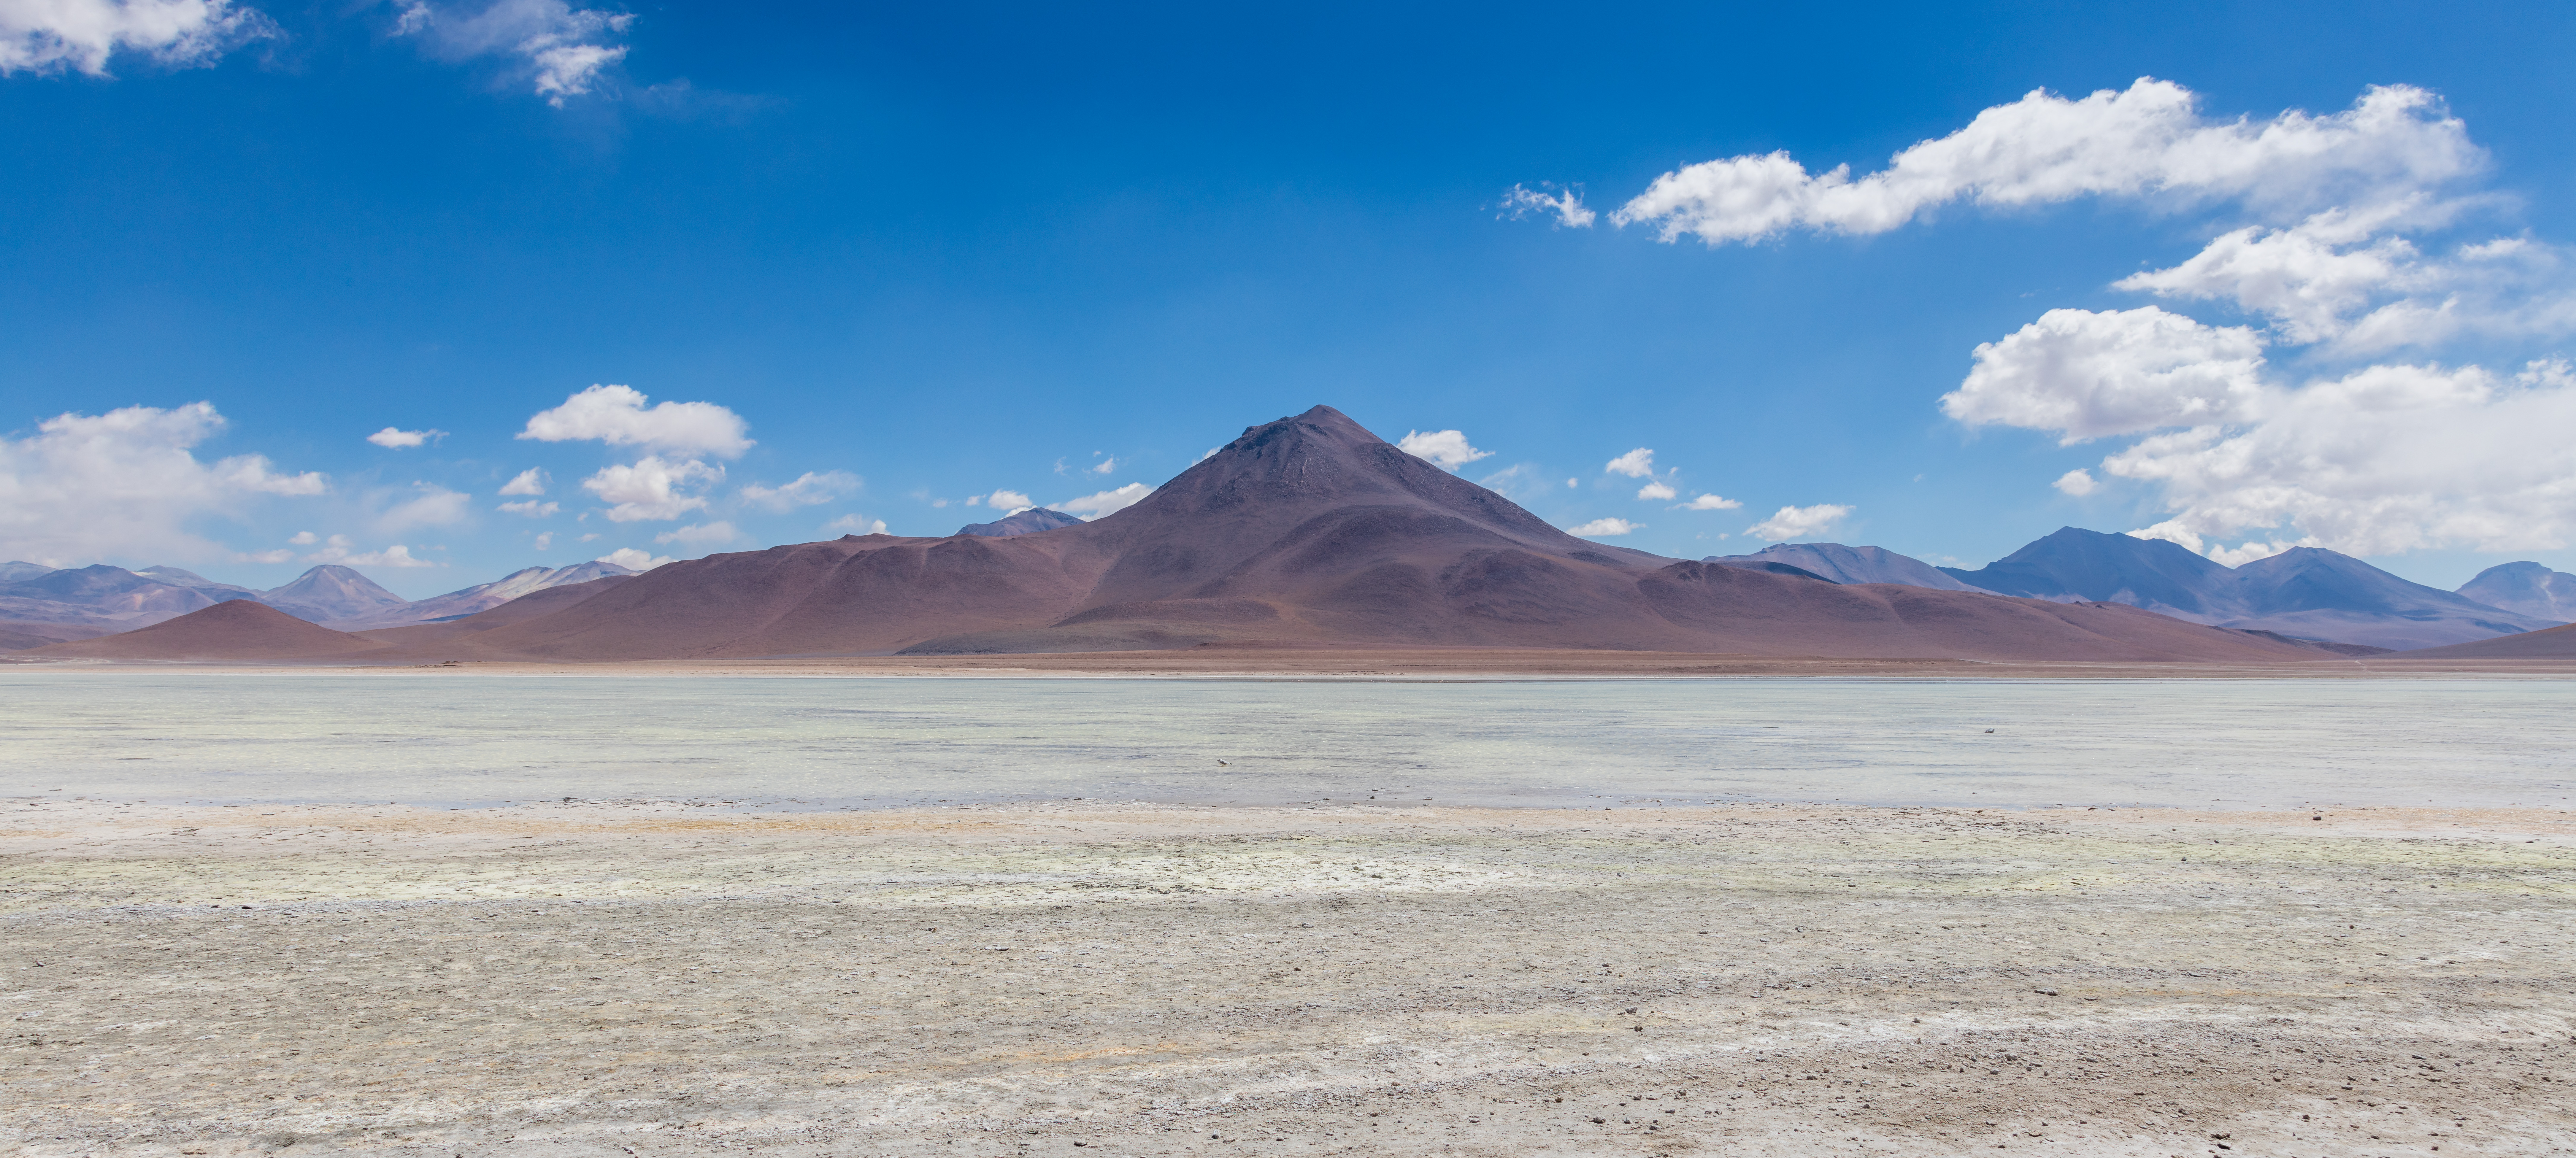 File:Laguna Blanca, Bolivia, 2016-02-02, DD 35.JPG ...  File:Laguna Bla...